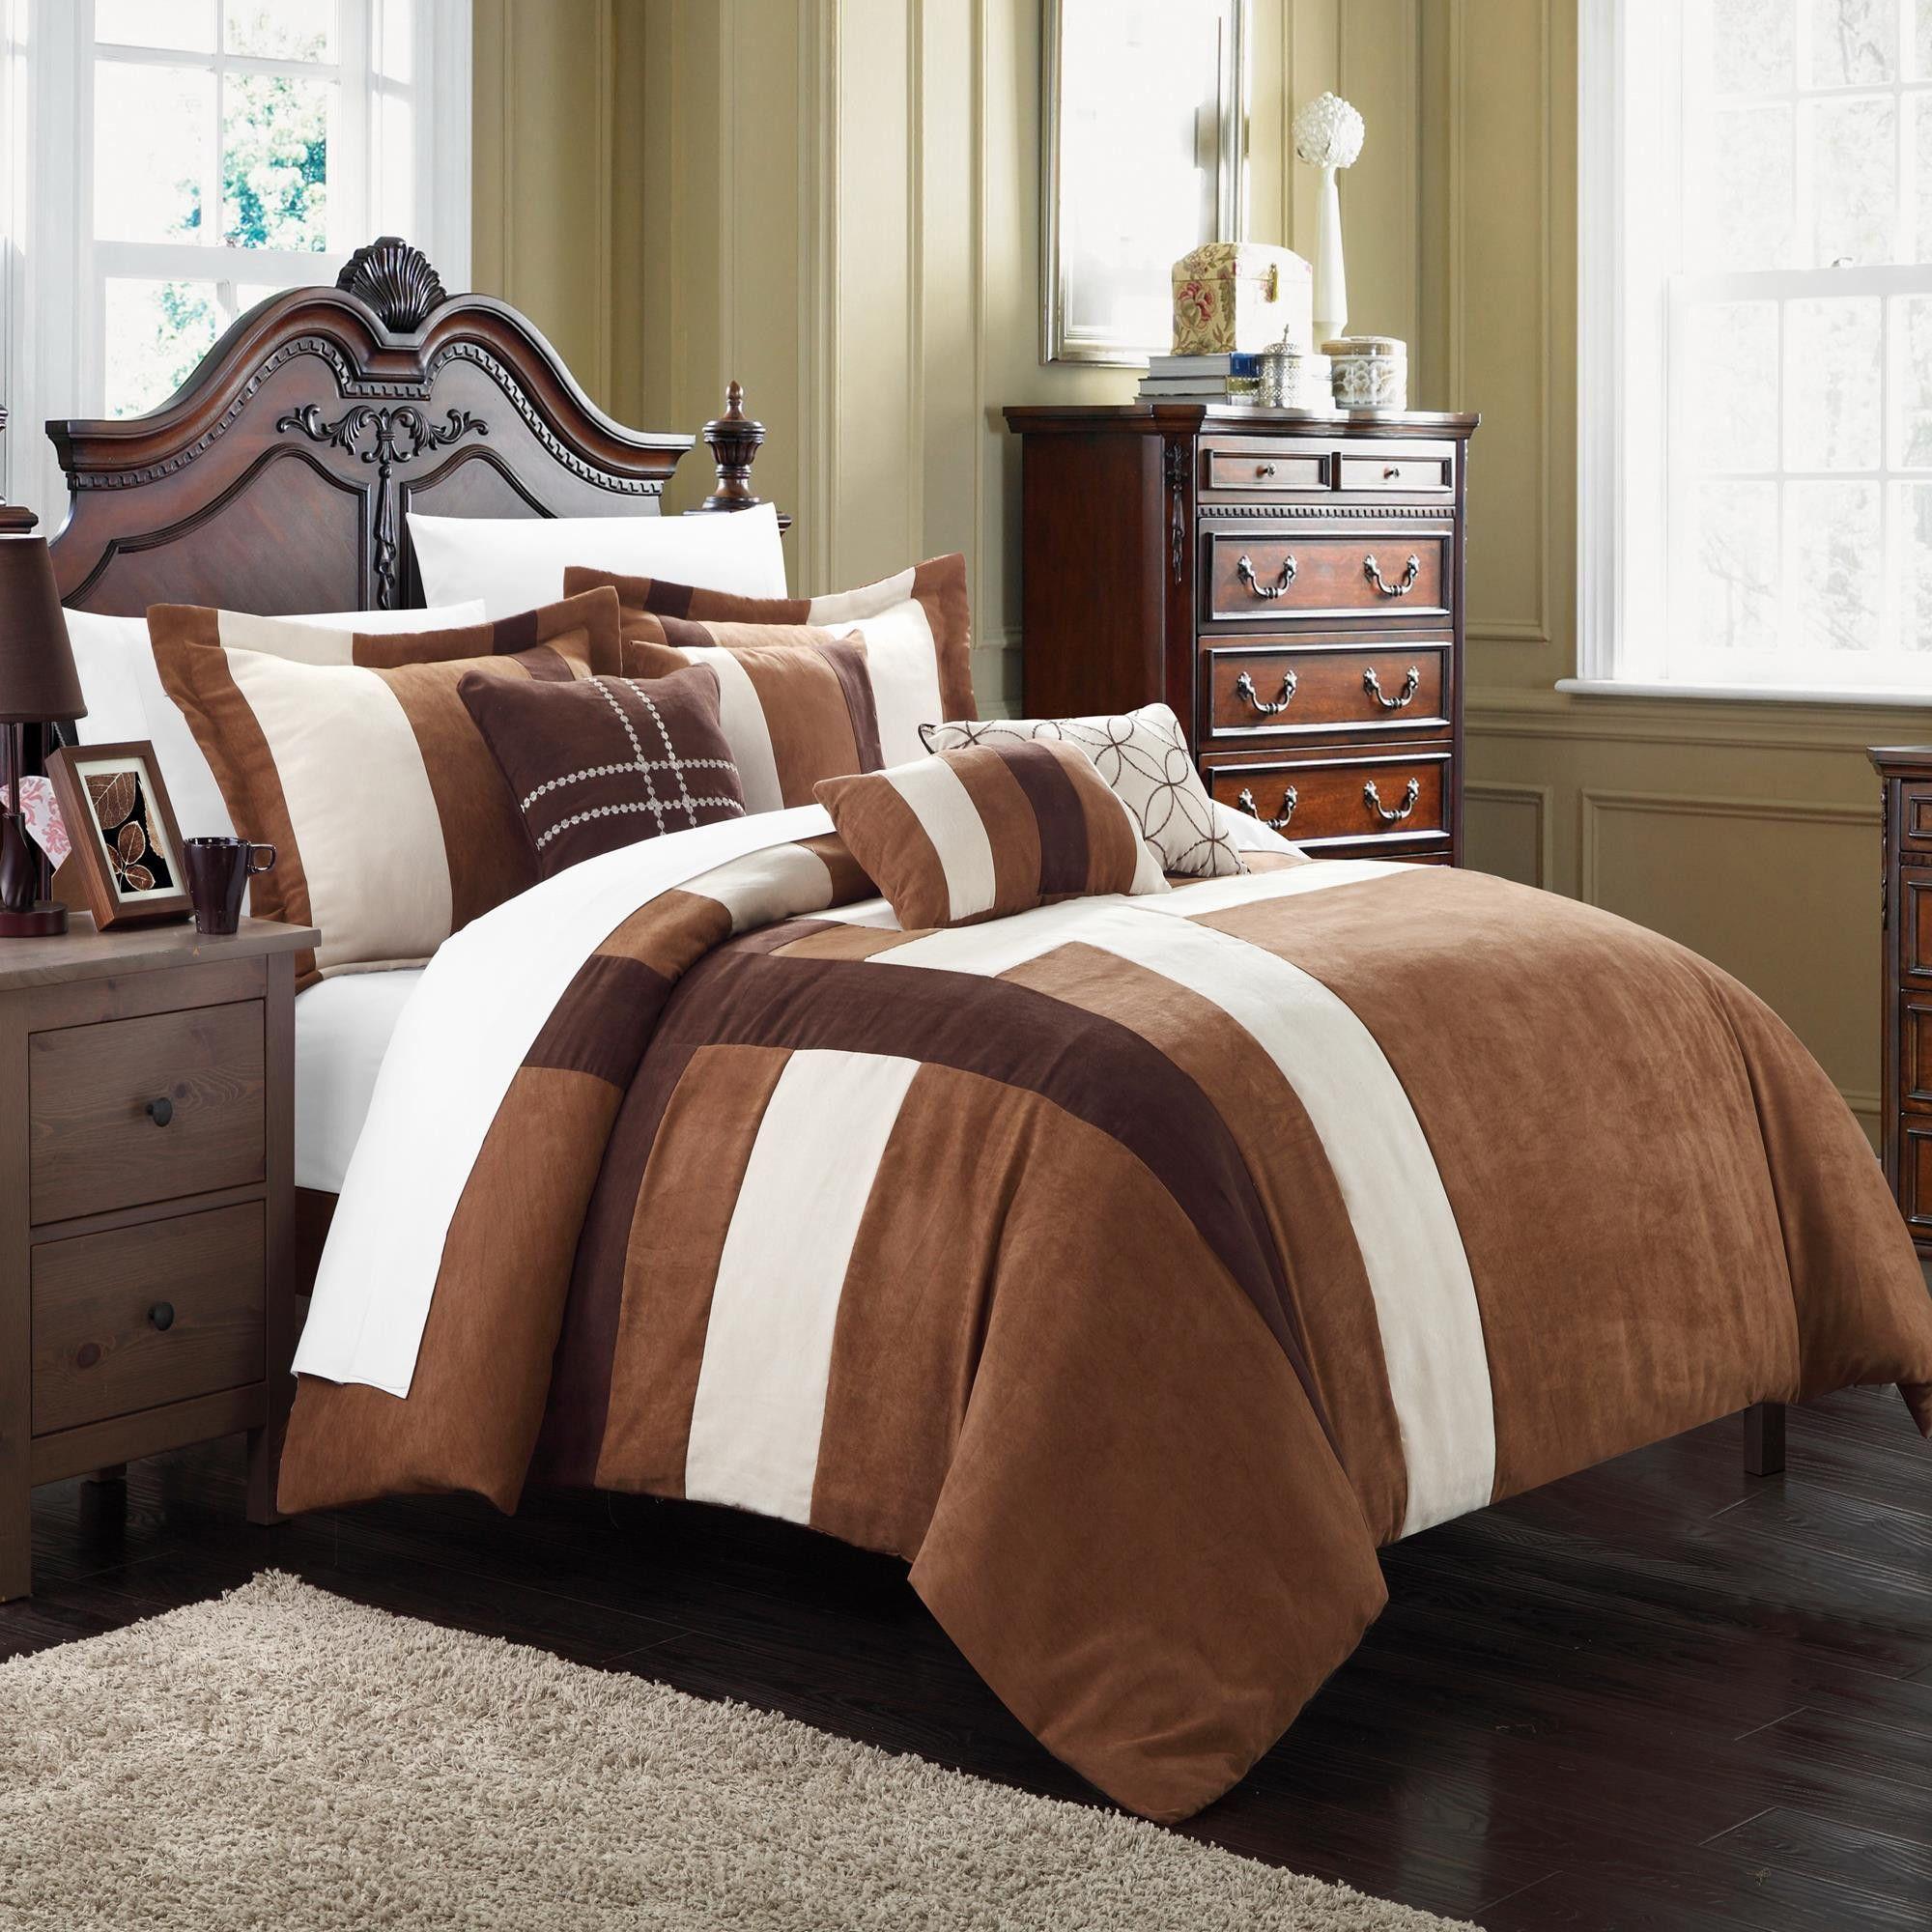 Regina Microsuede Brown Amp Cream 11 Piece Comforter Bed In A Bag Set Home Home Bedroom